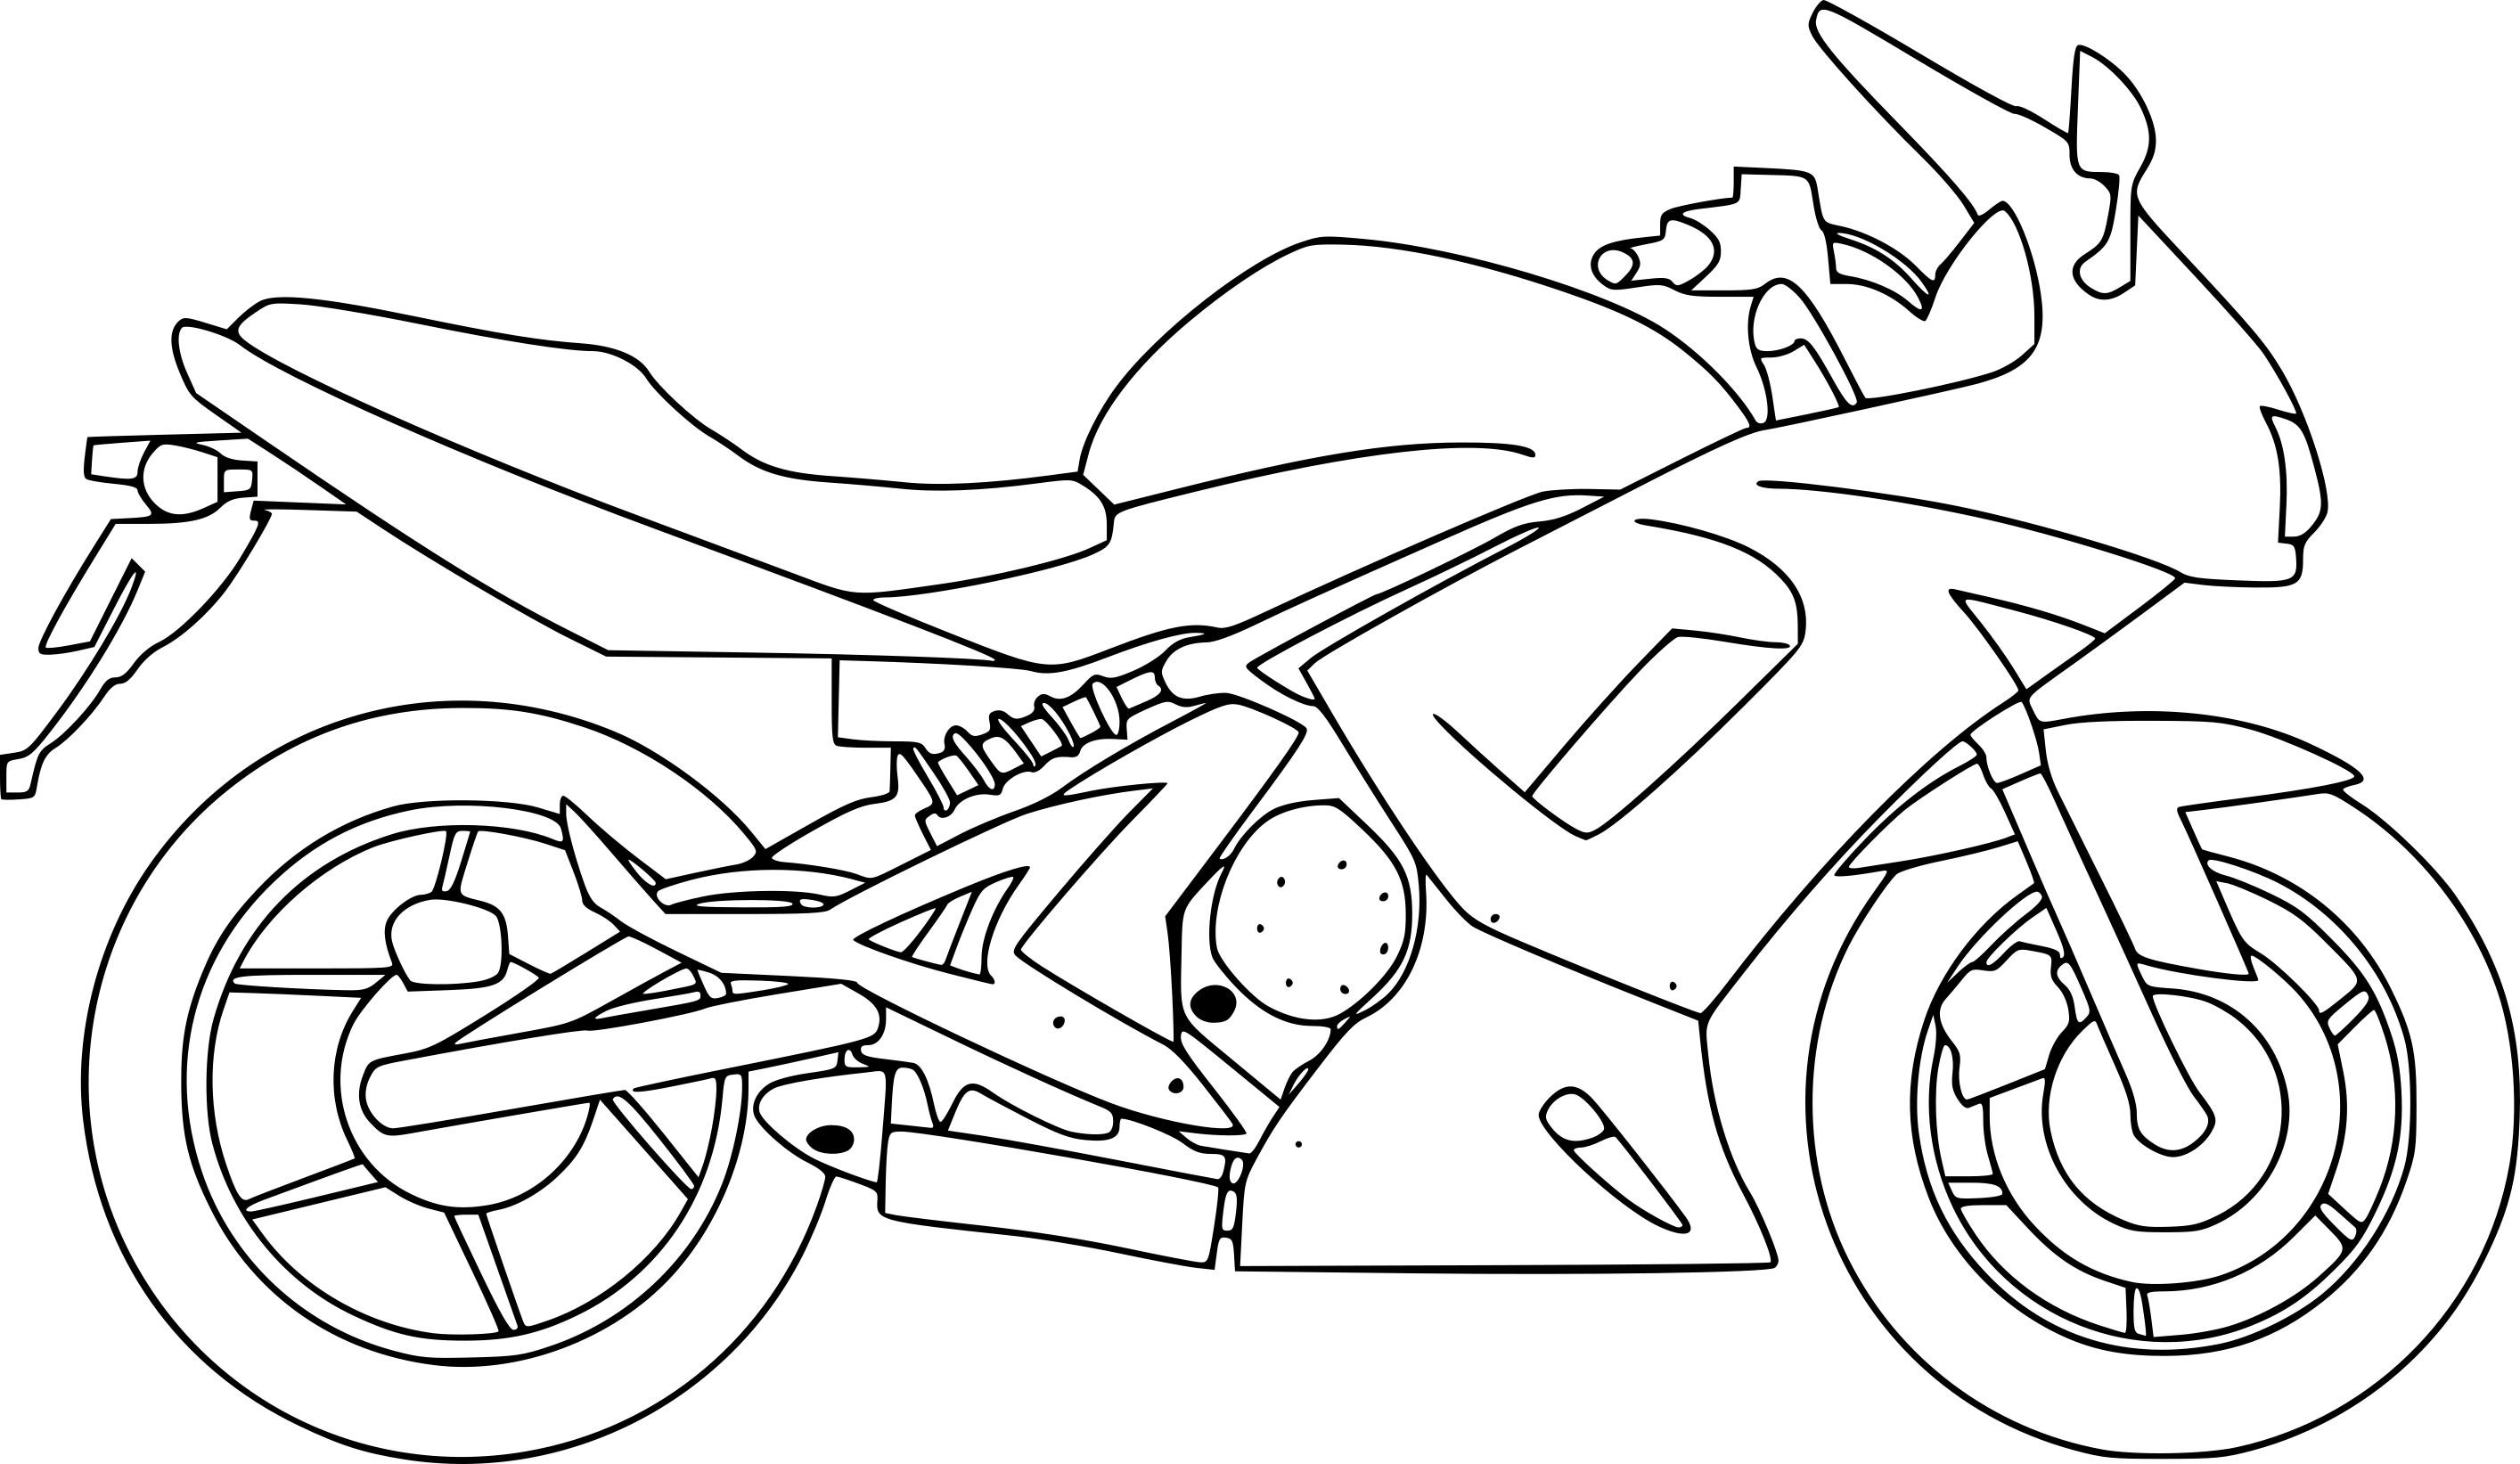 Élégant Dessin A Imprimer Moto Trial